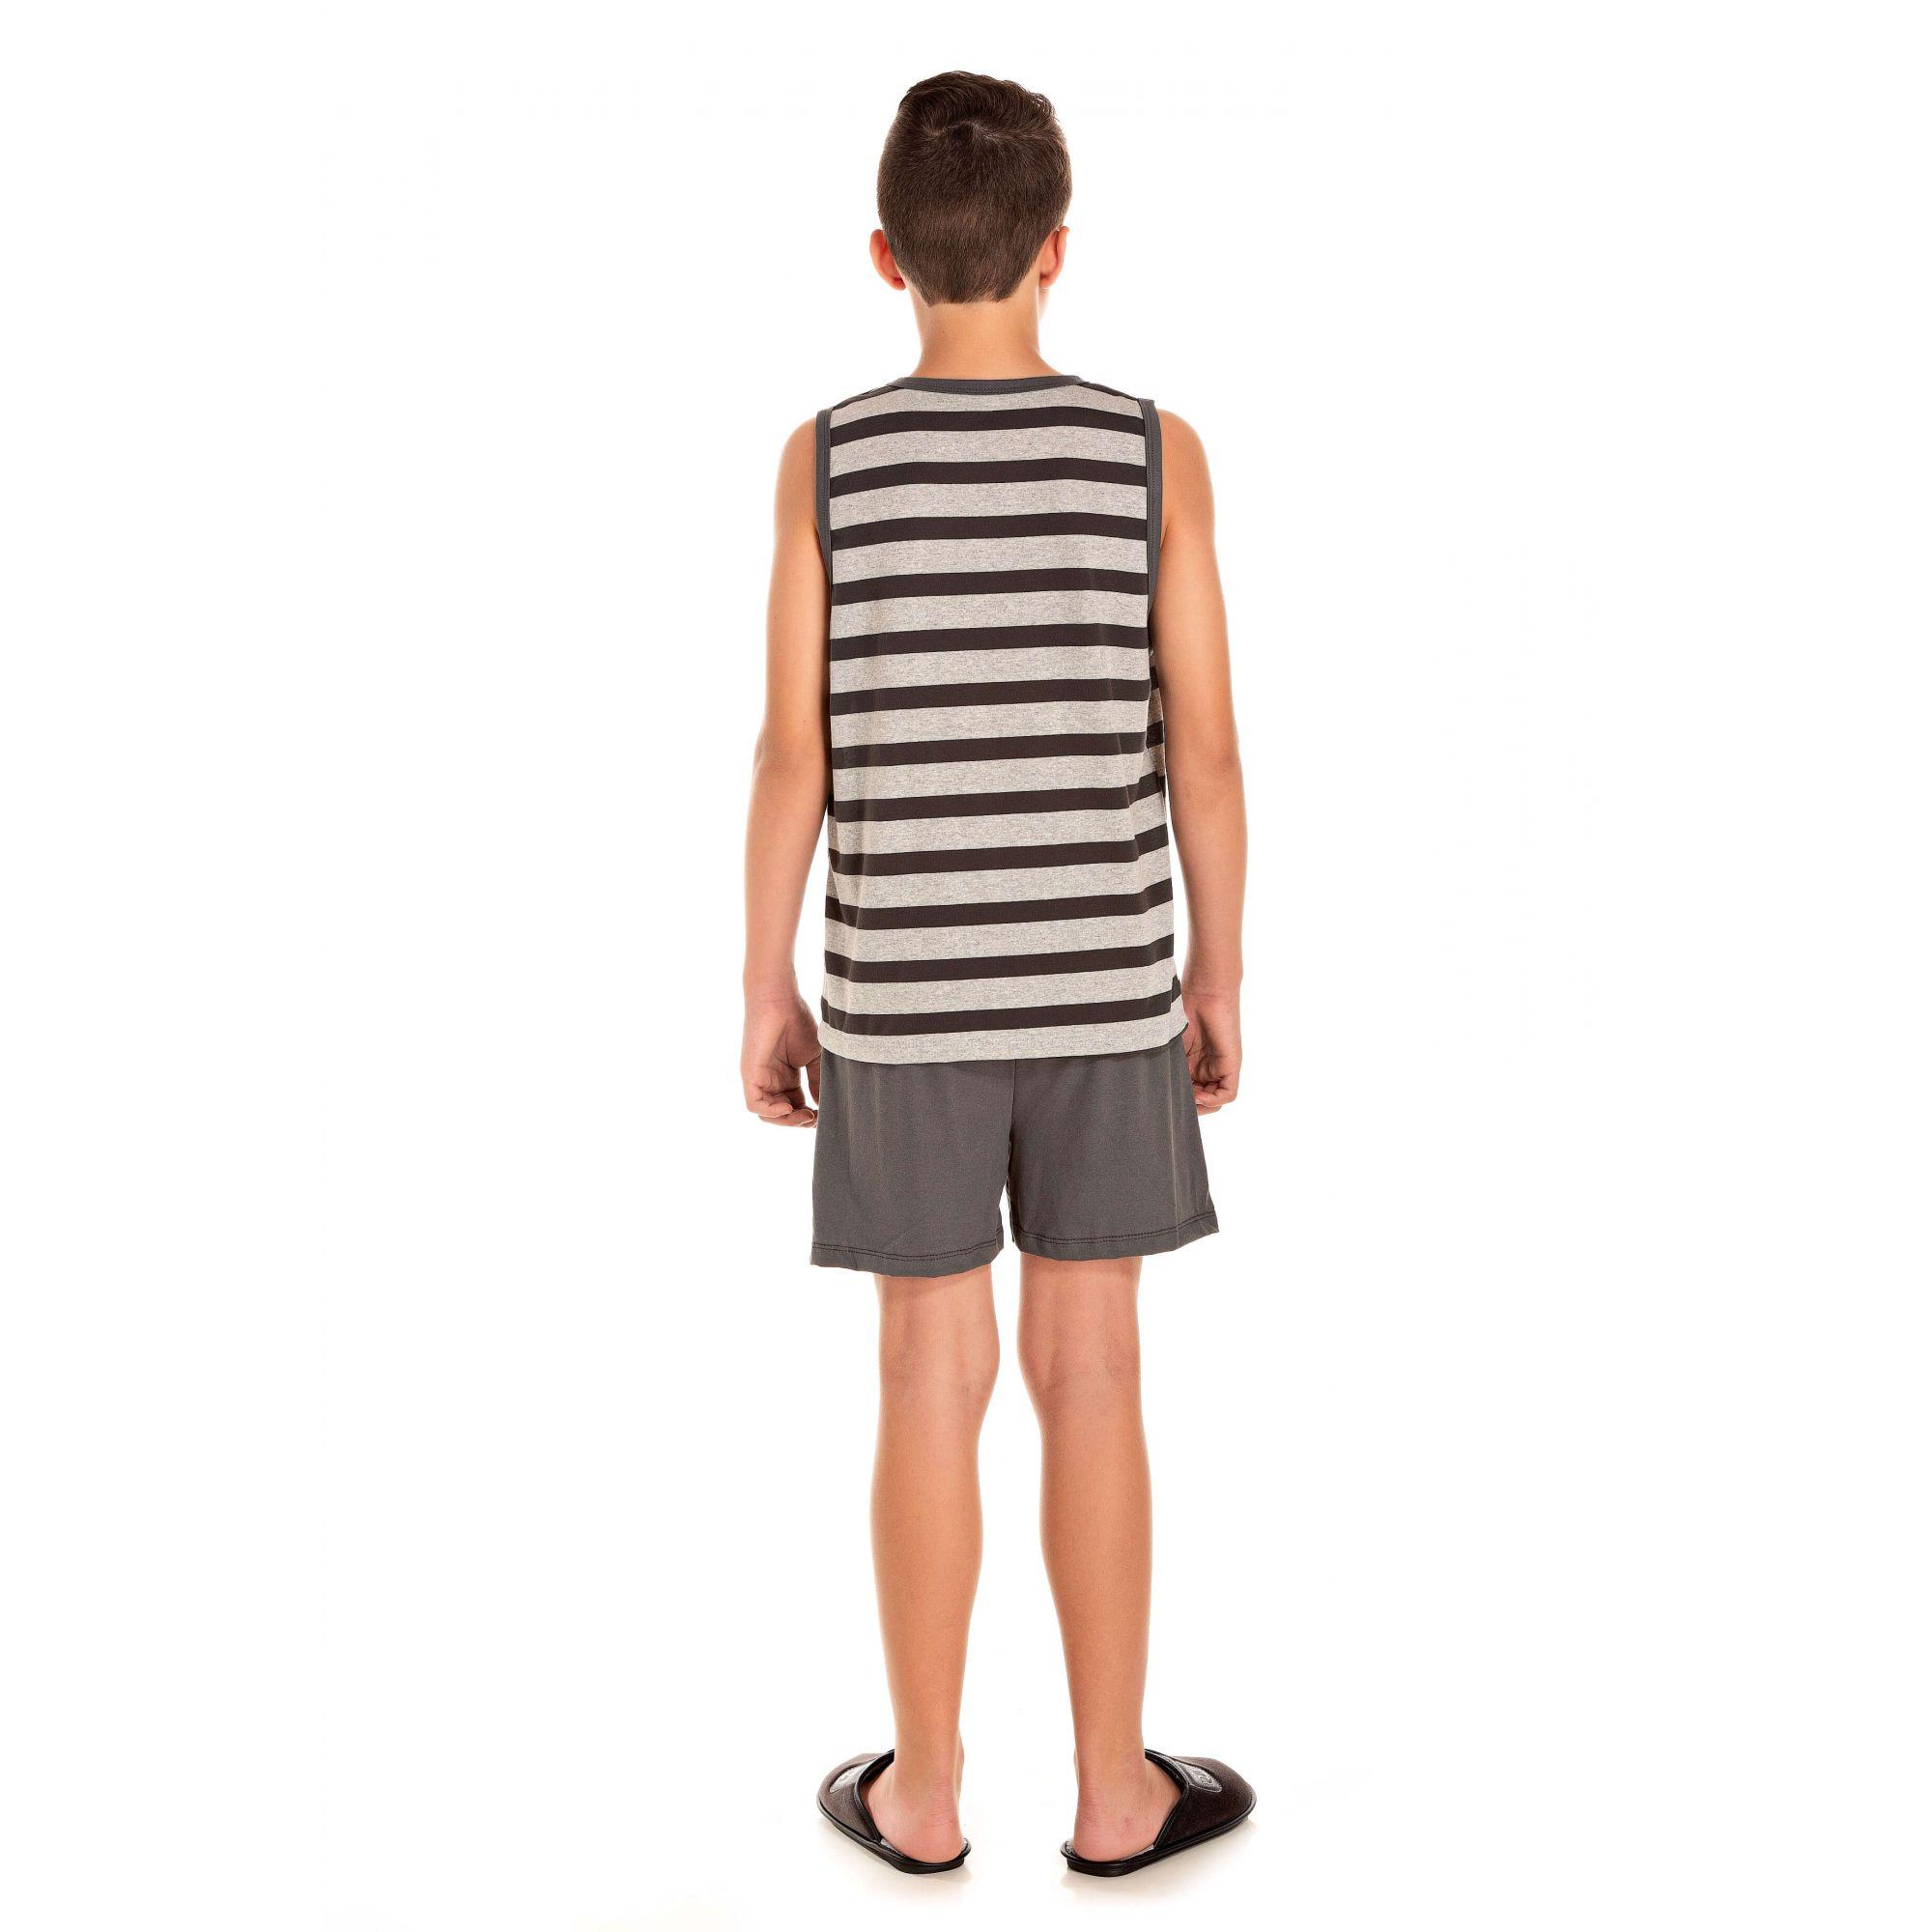 102/H - Pijama Juvenil Masculino Surf - Listrado